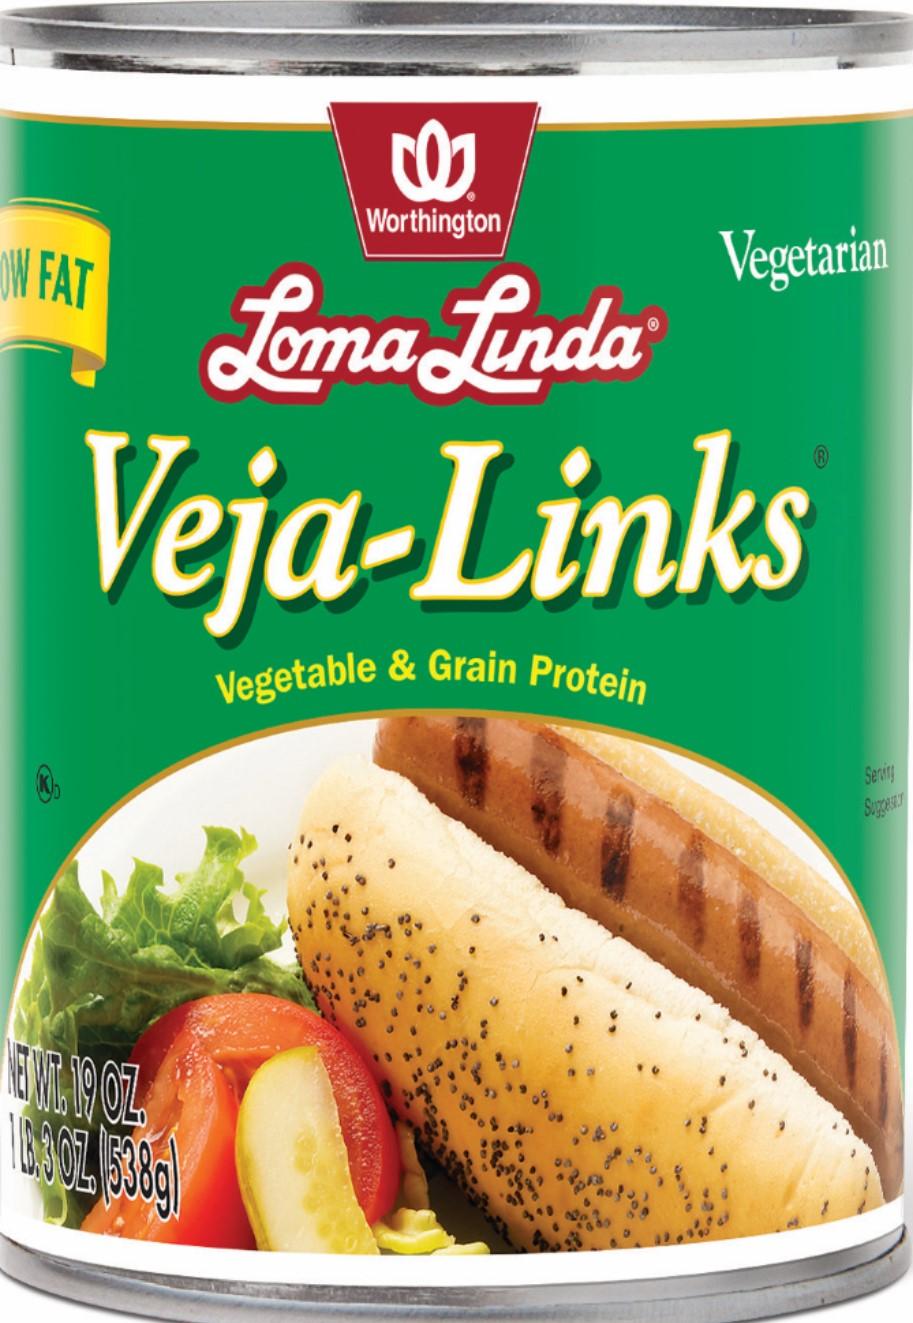 VEJA LINKS LOW FAT CASE,WORTHINGTON LF,00074